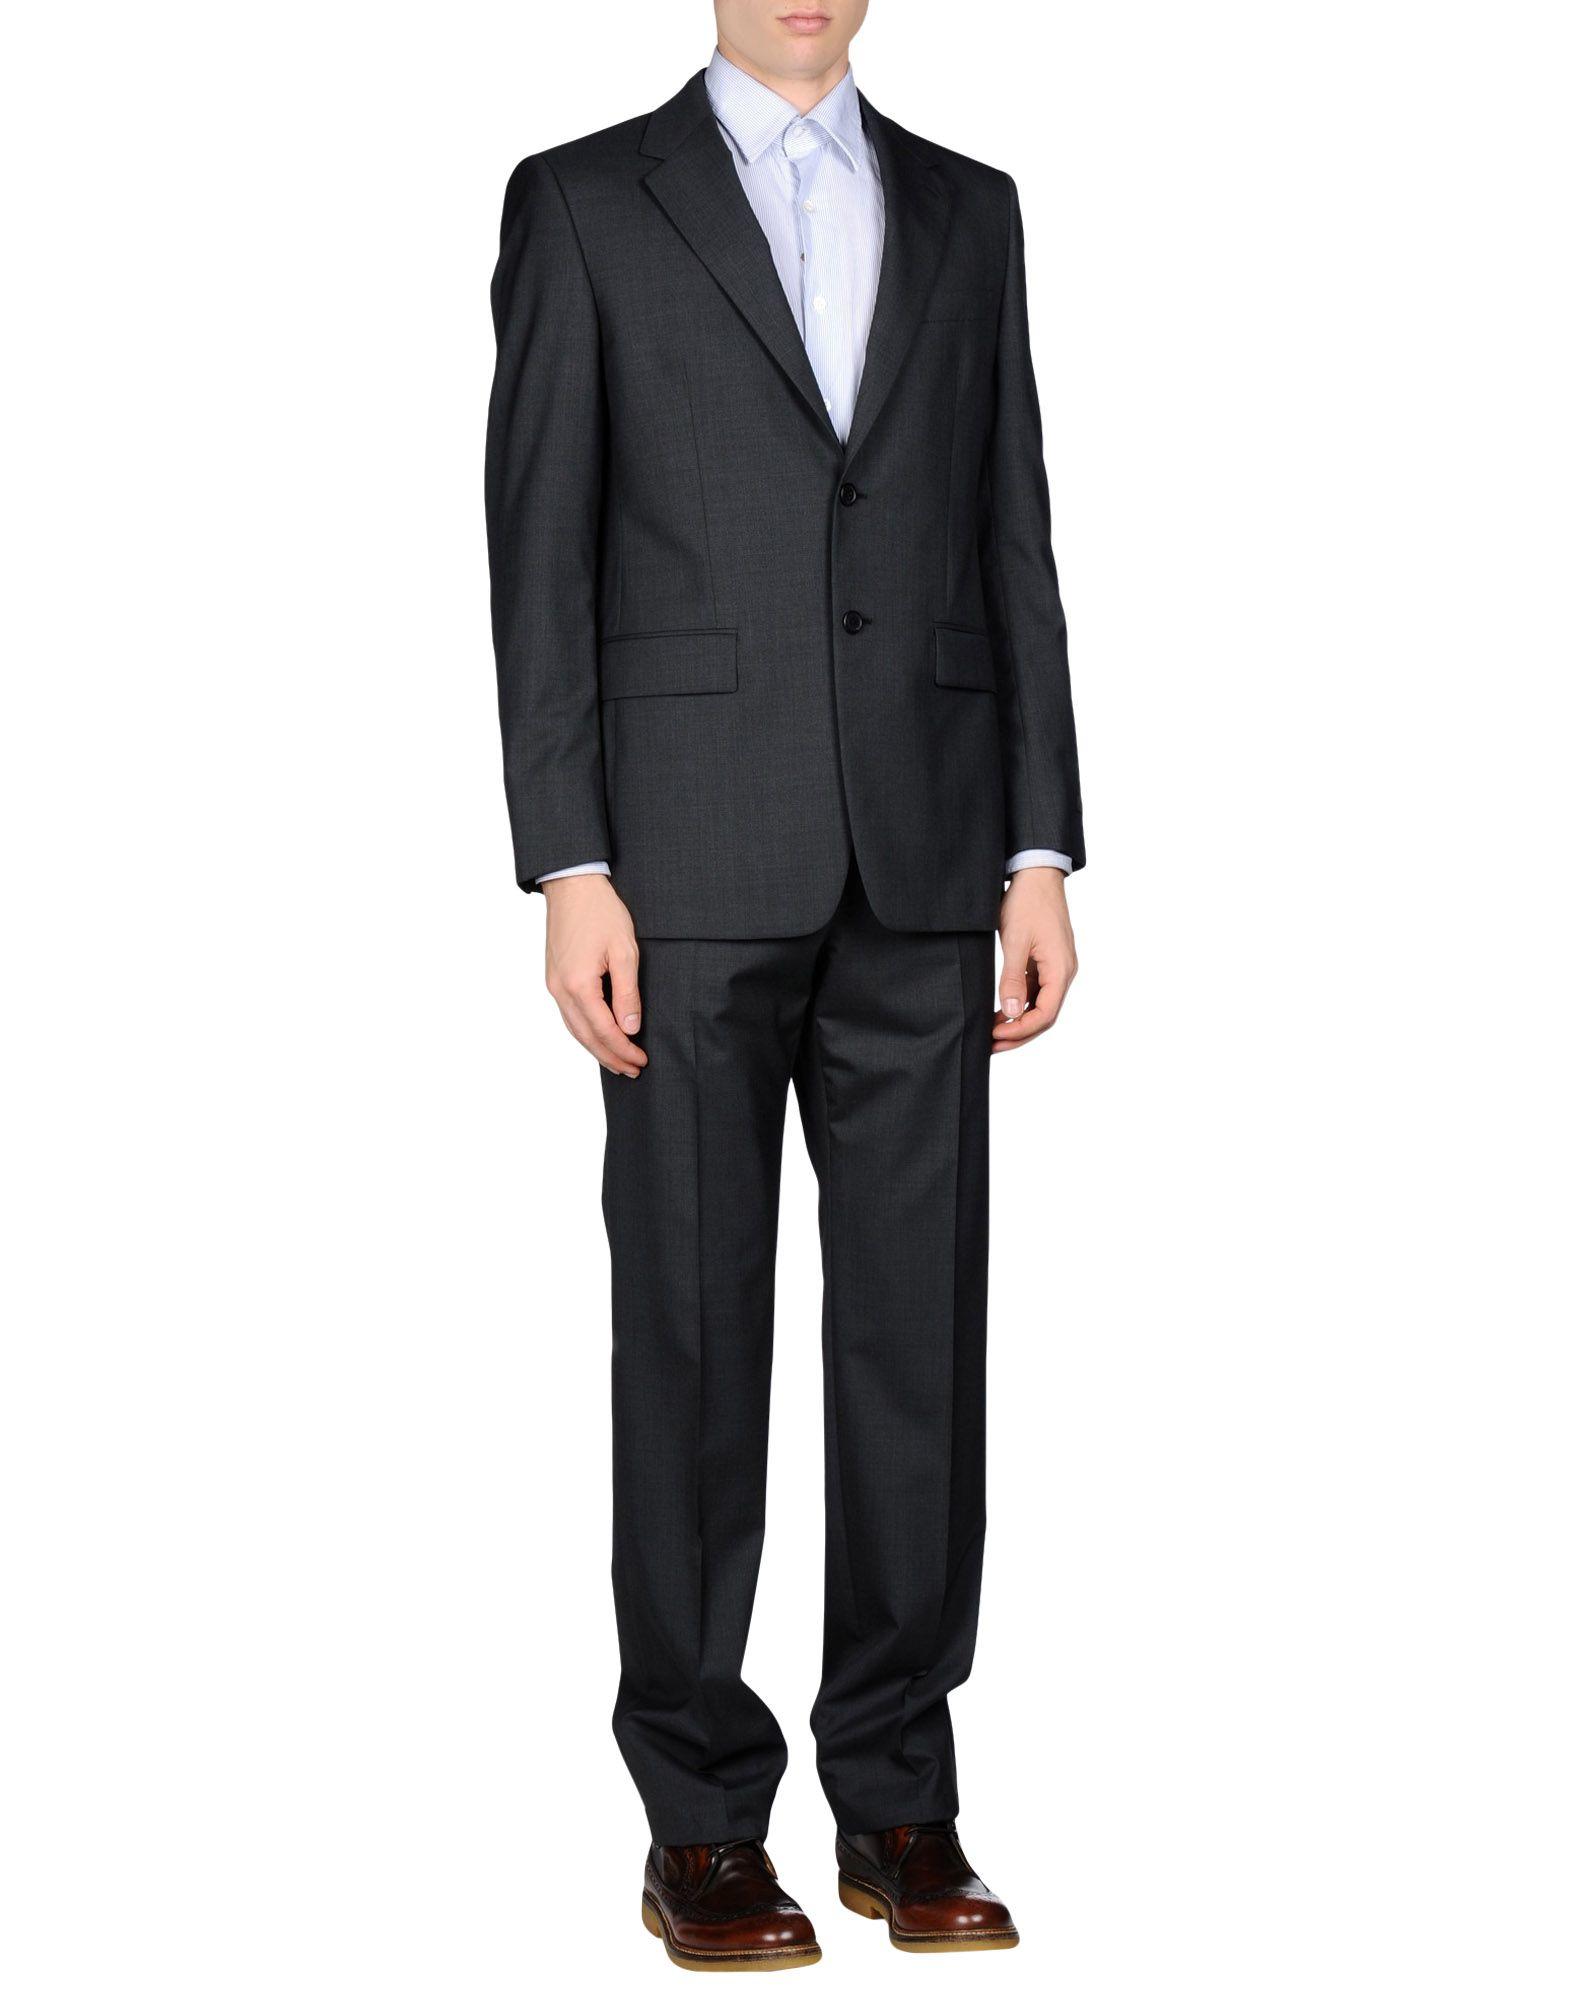 Prada Mens Suits 57